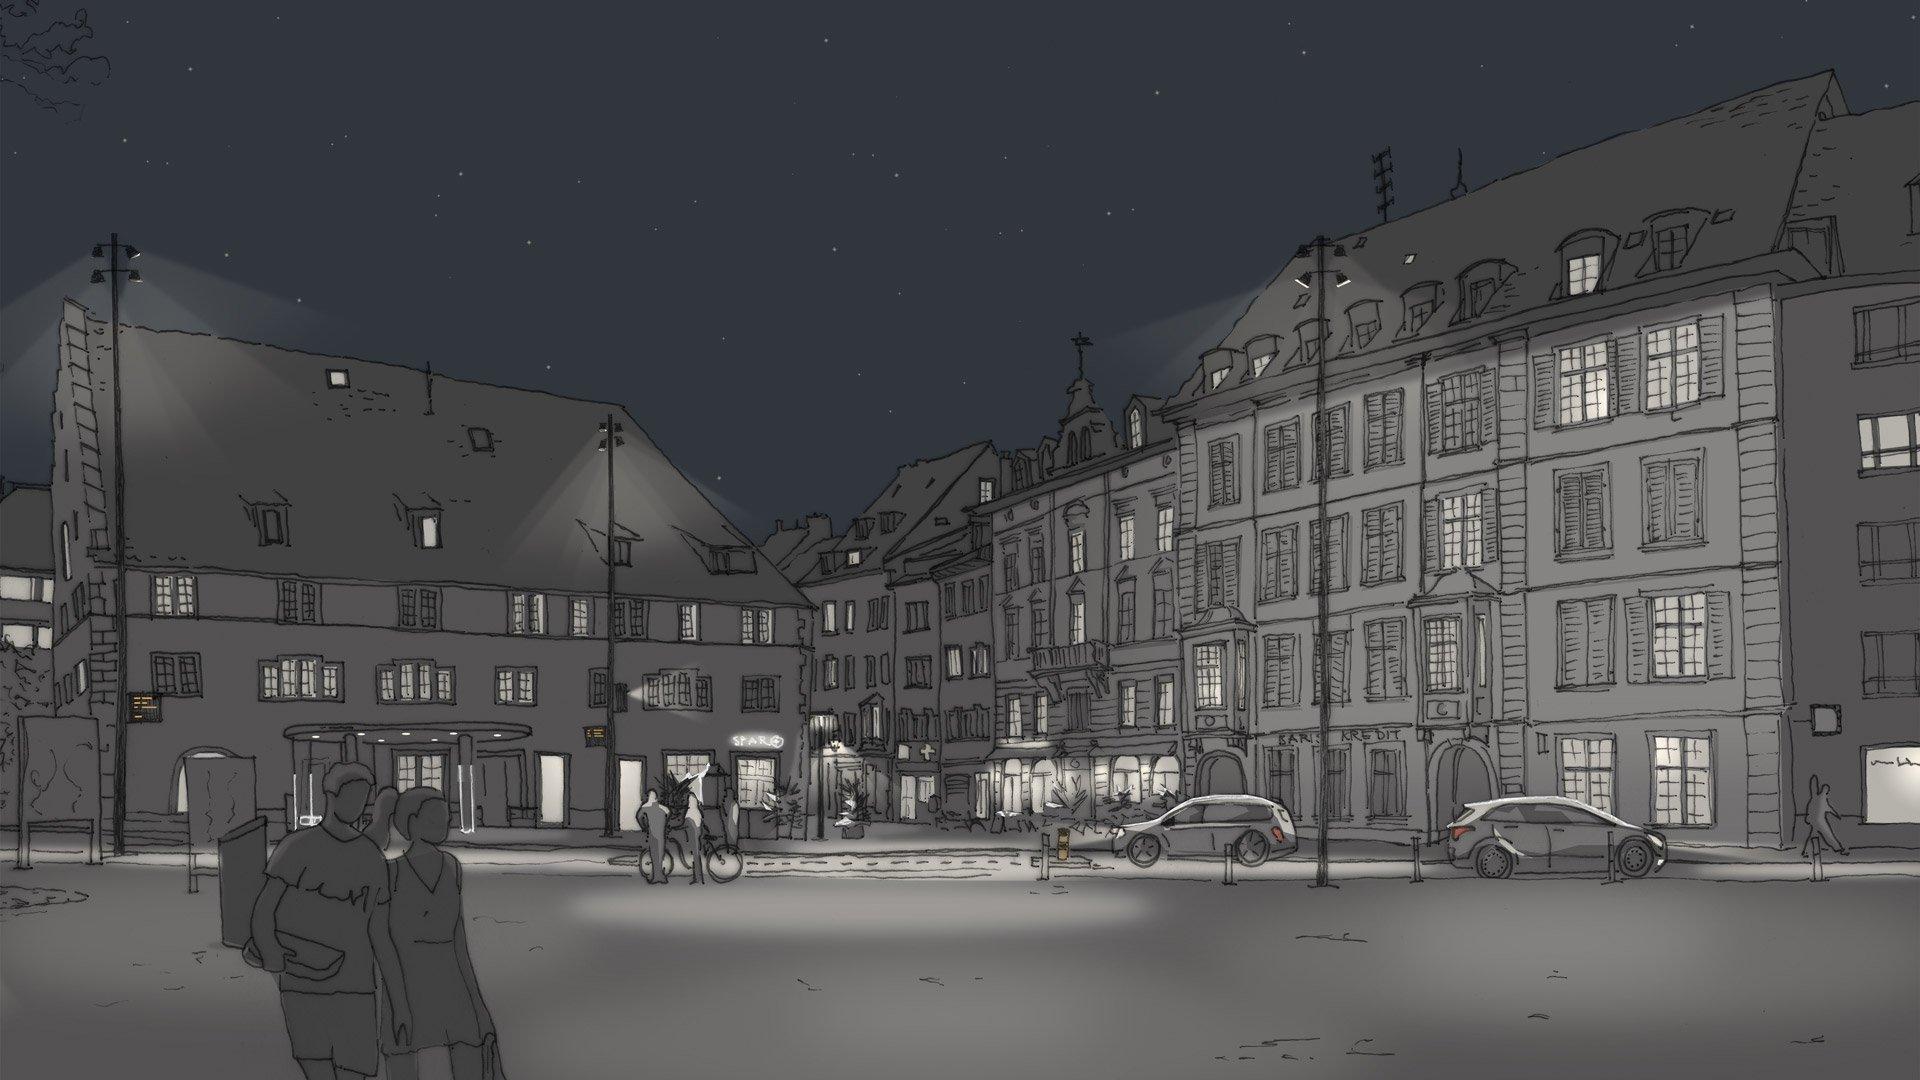 Fassadenbeleuchtung Freier Platz Visualisierung für Altstadtbeleuchtung Schaffhausen